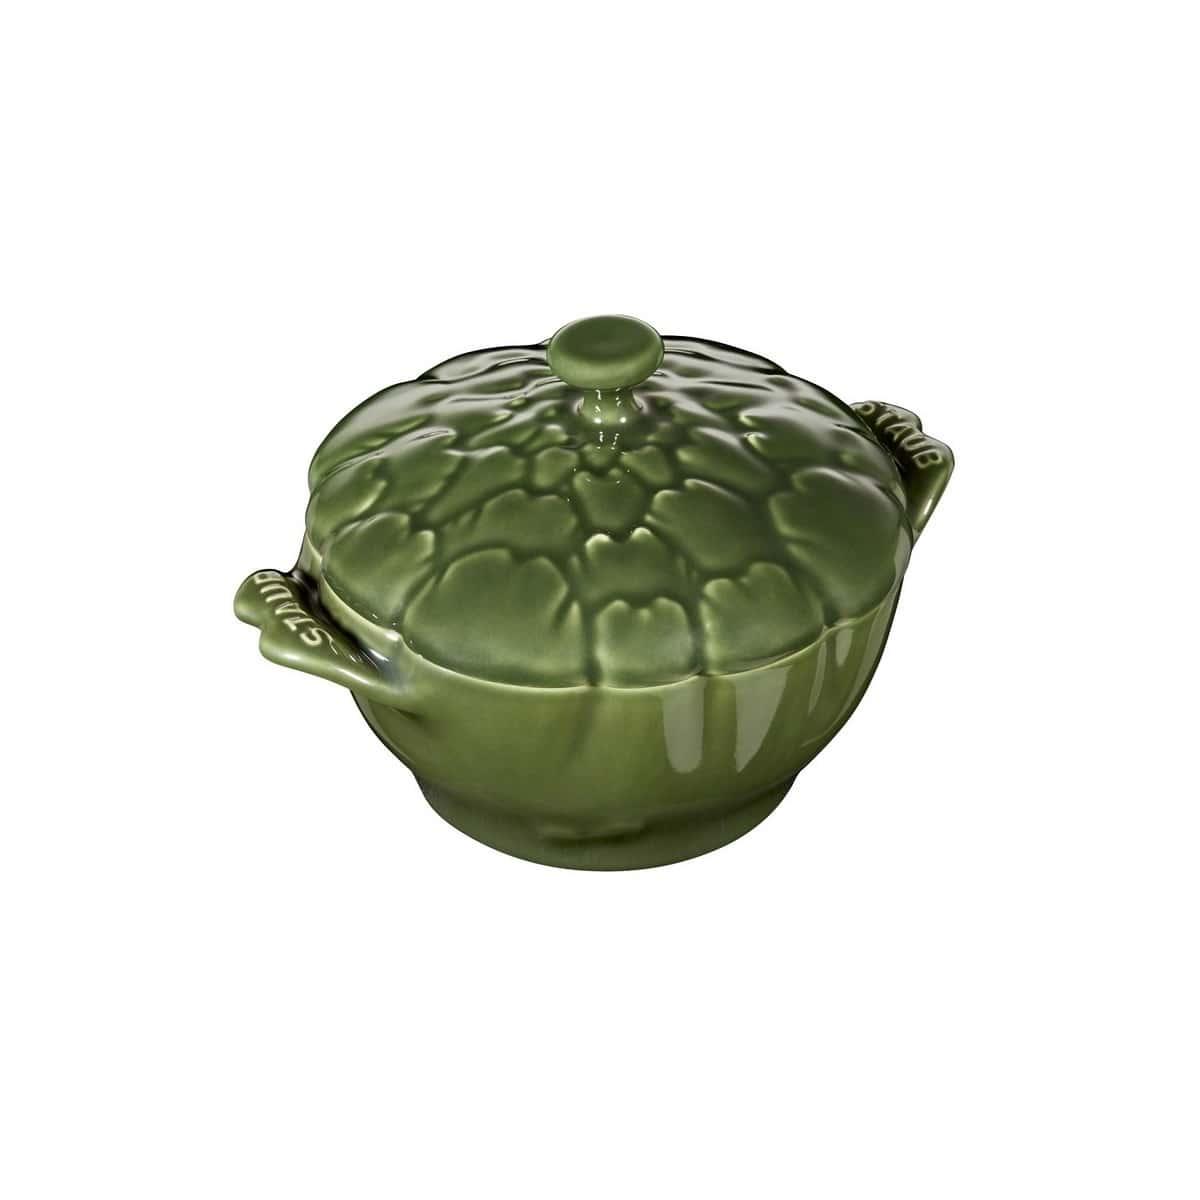 Кокот Артишок Staub 12,5 см, темно-зеленый